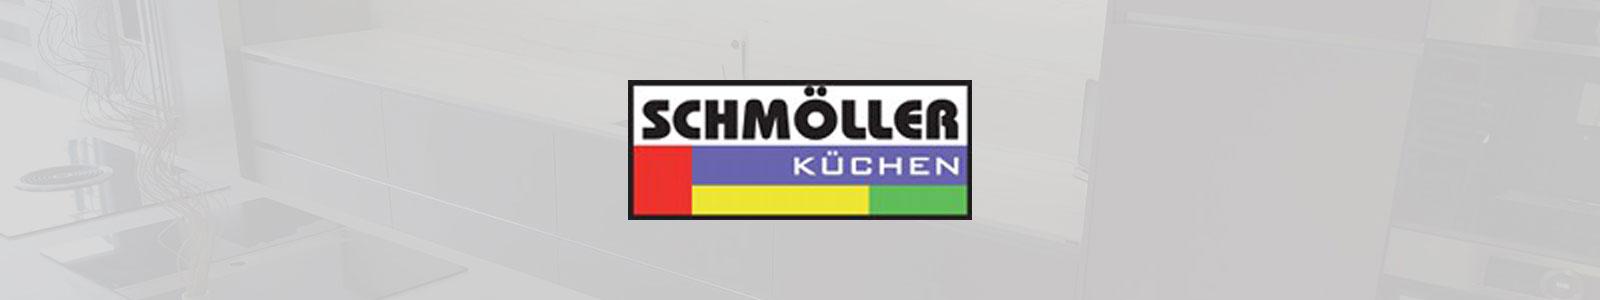 Schmöller Küchen Ingolstadt